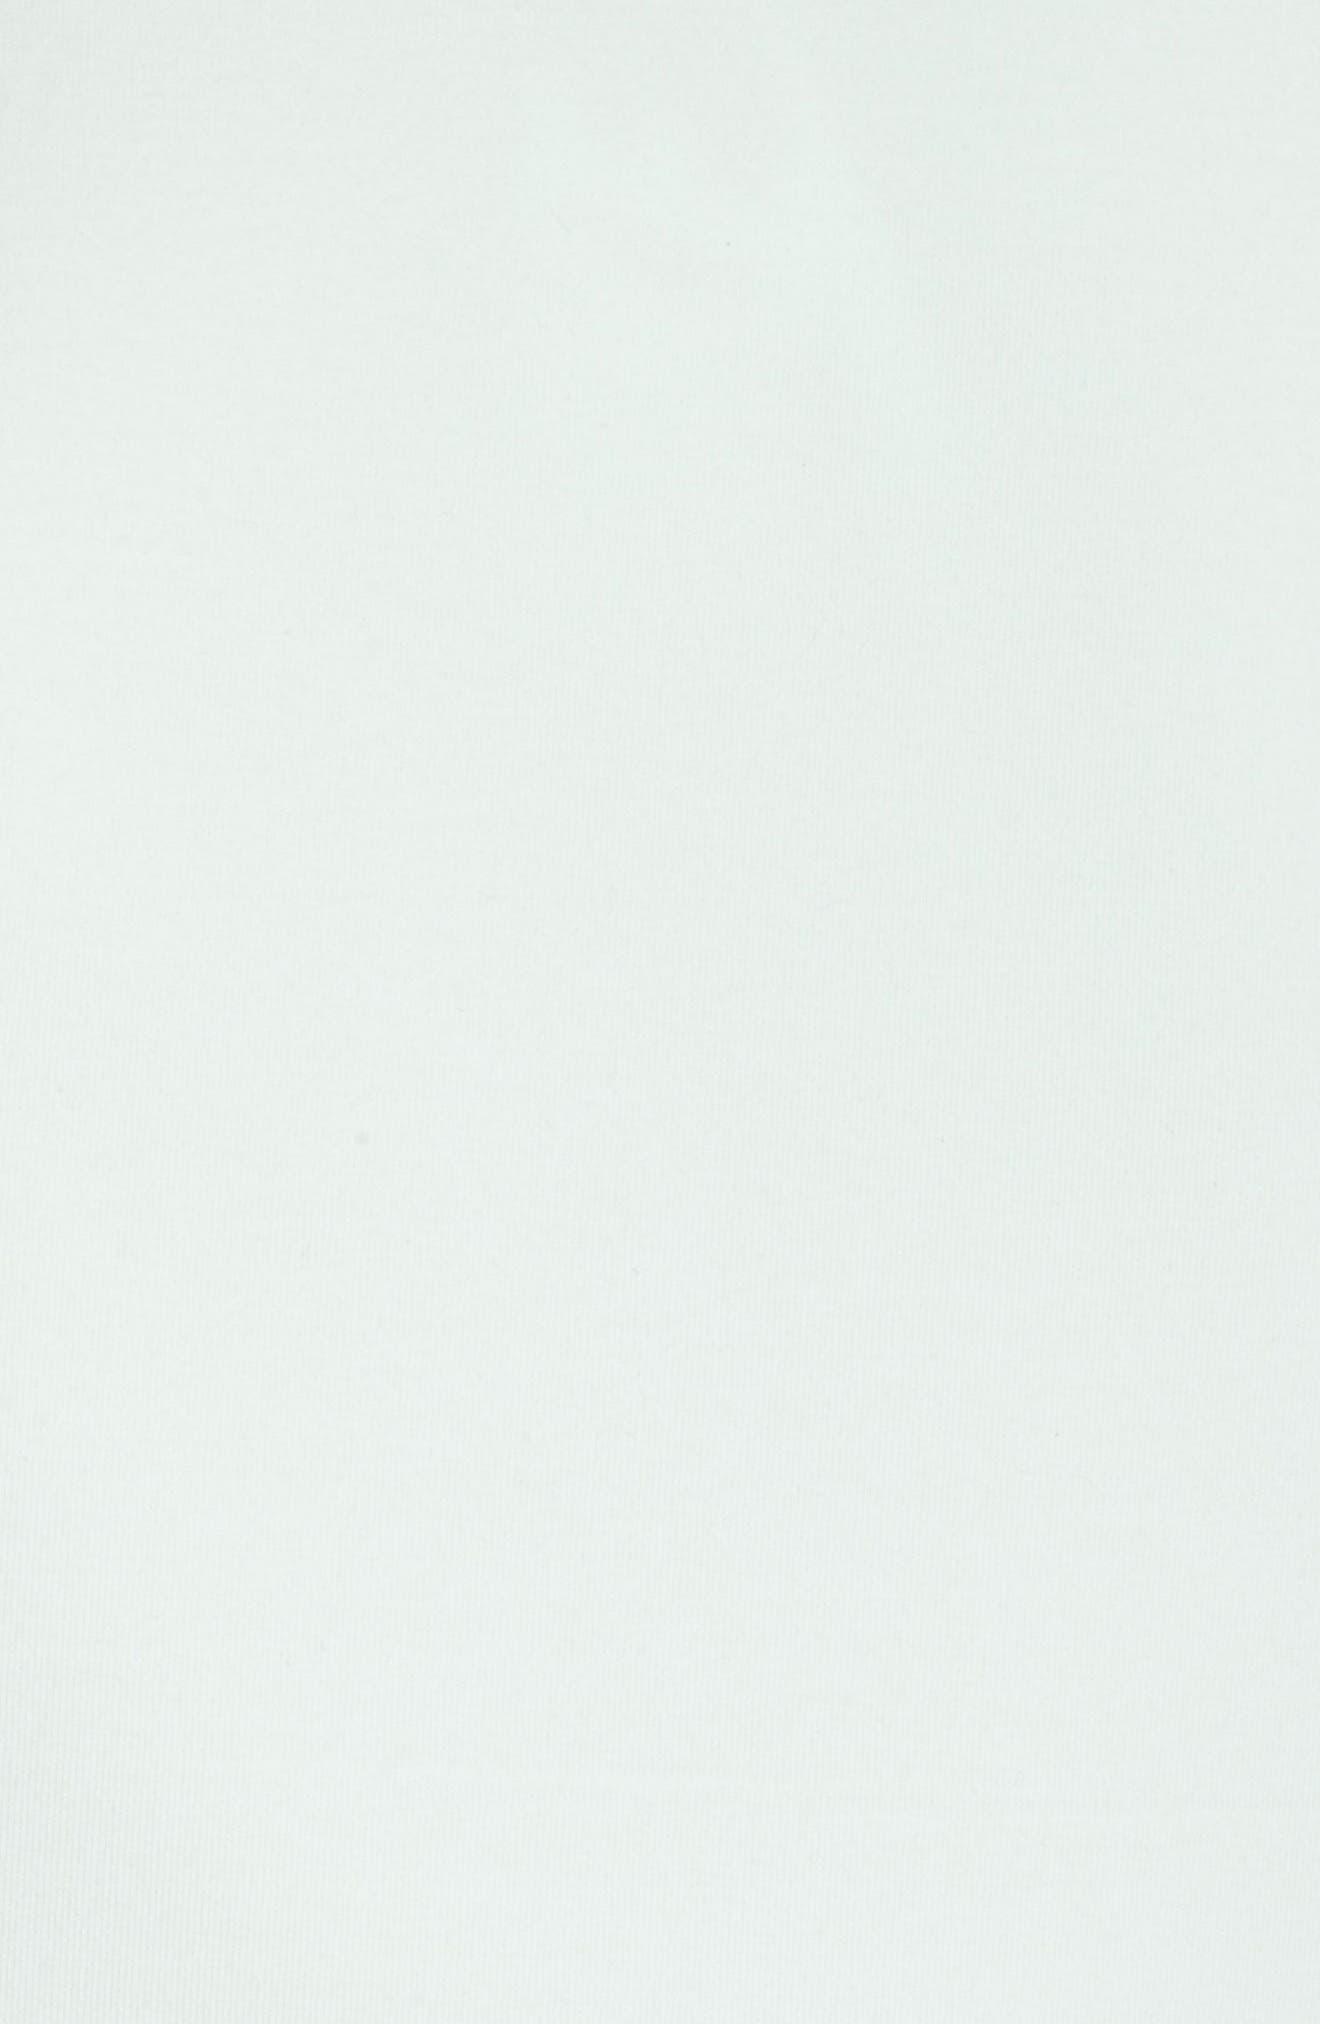 NikeLab ACG Fleece Women's Crewneck Top,                             Alternate thumbnail 6, color,                             Barely Green/ Team Orange